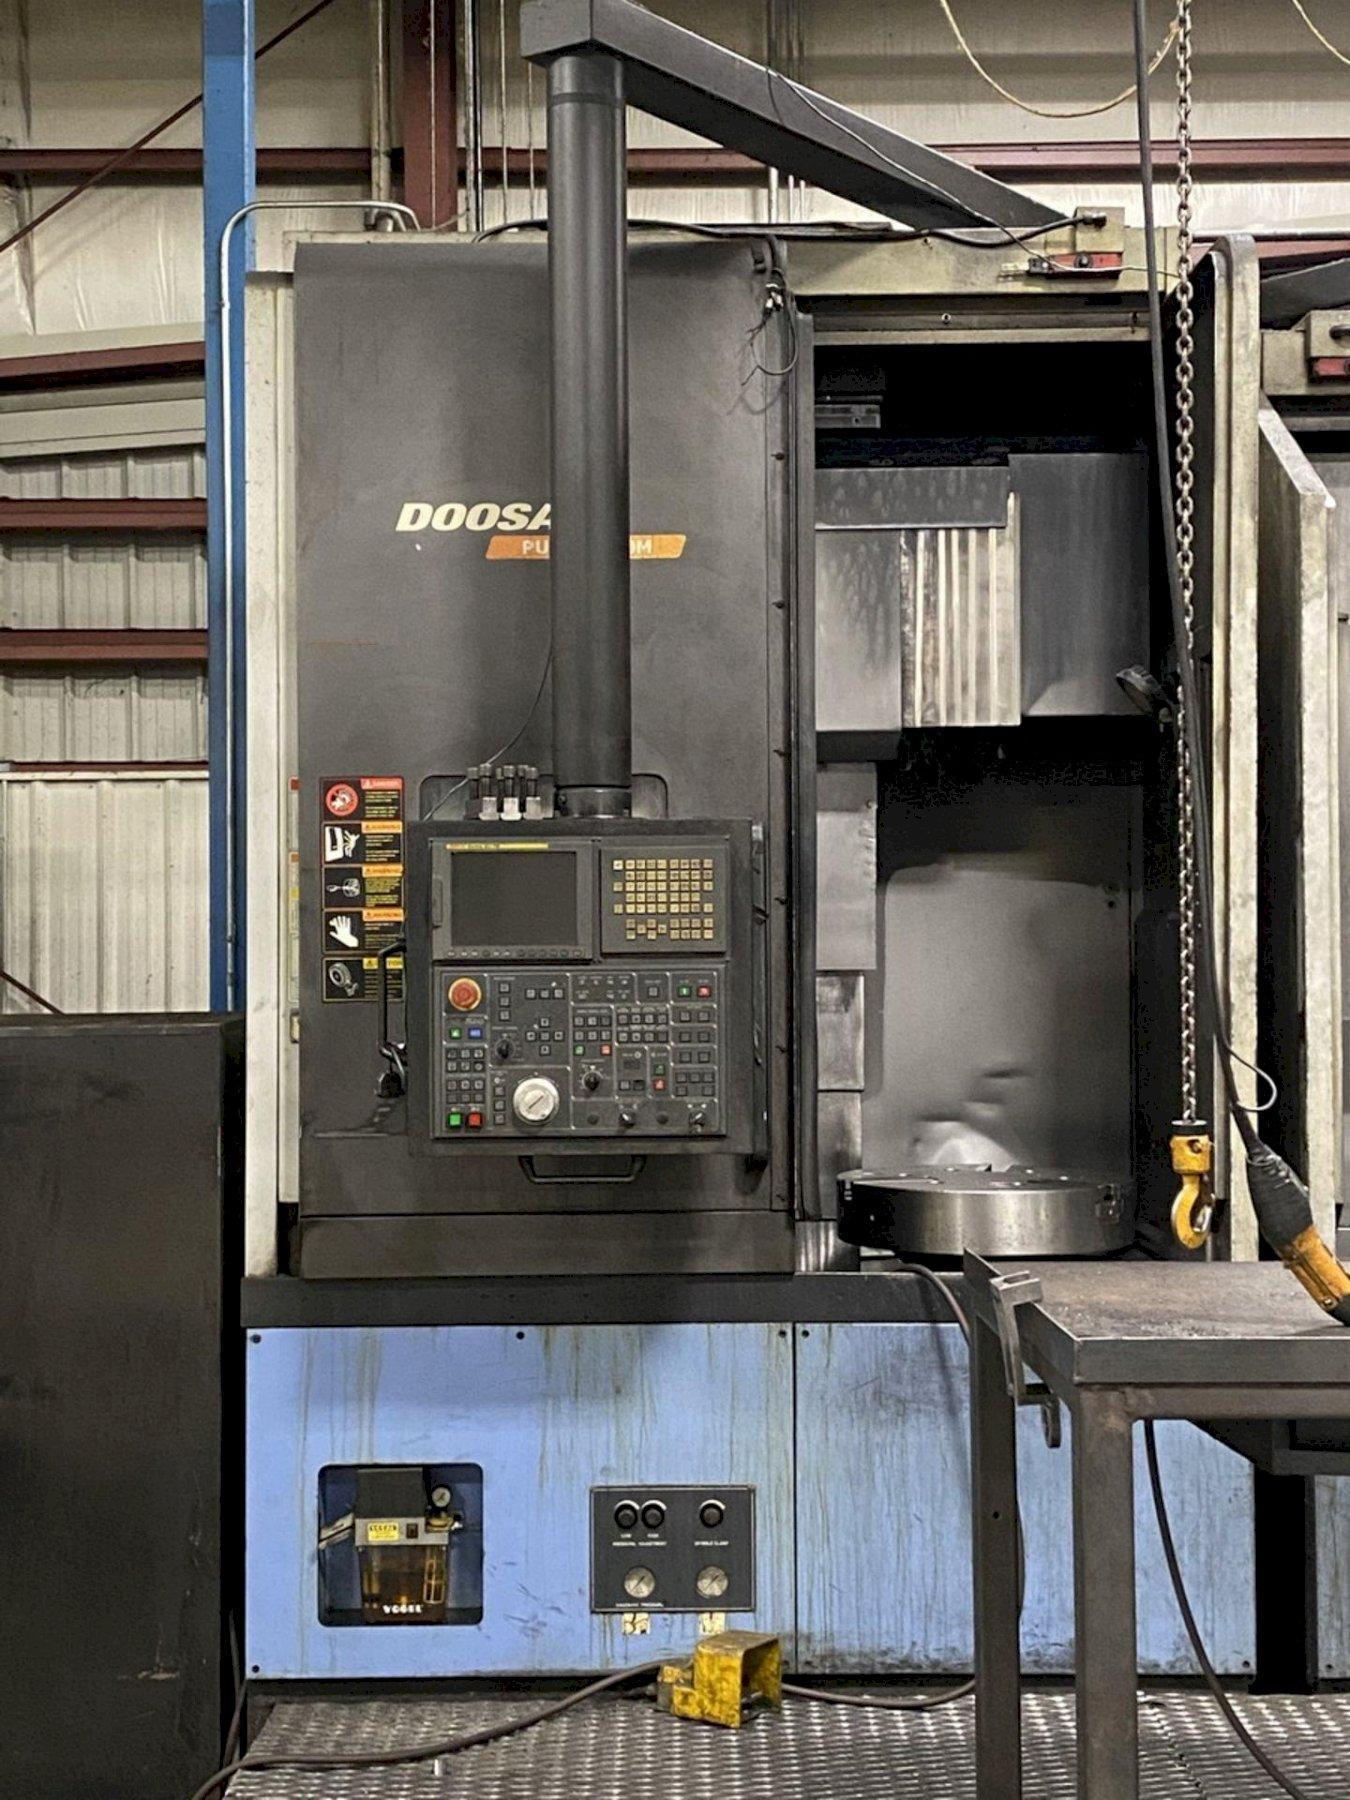 "Doosan Puma V550M CNC Vertical Lathe (2008), Fanuc i, 24"" Chuck, 31.5"" Swing, 50 HP, Milling, 12 Position Turret, 2000 RPM, 15.3""/30.7"" Travels"